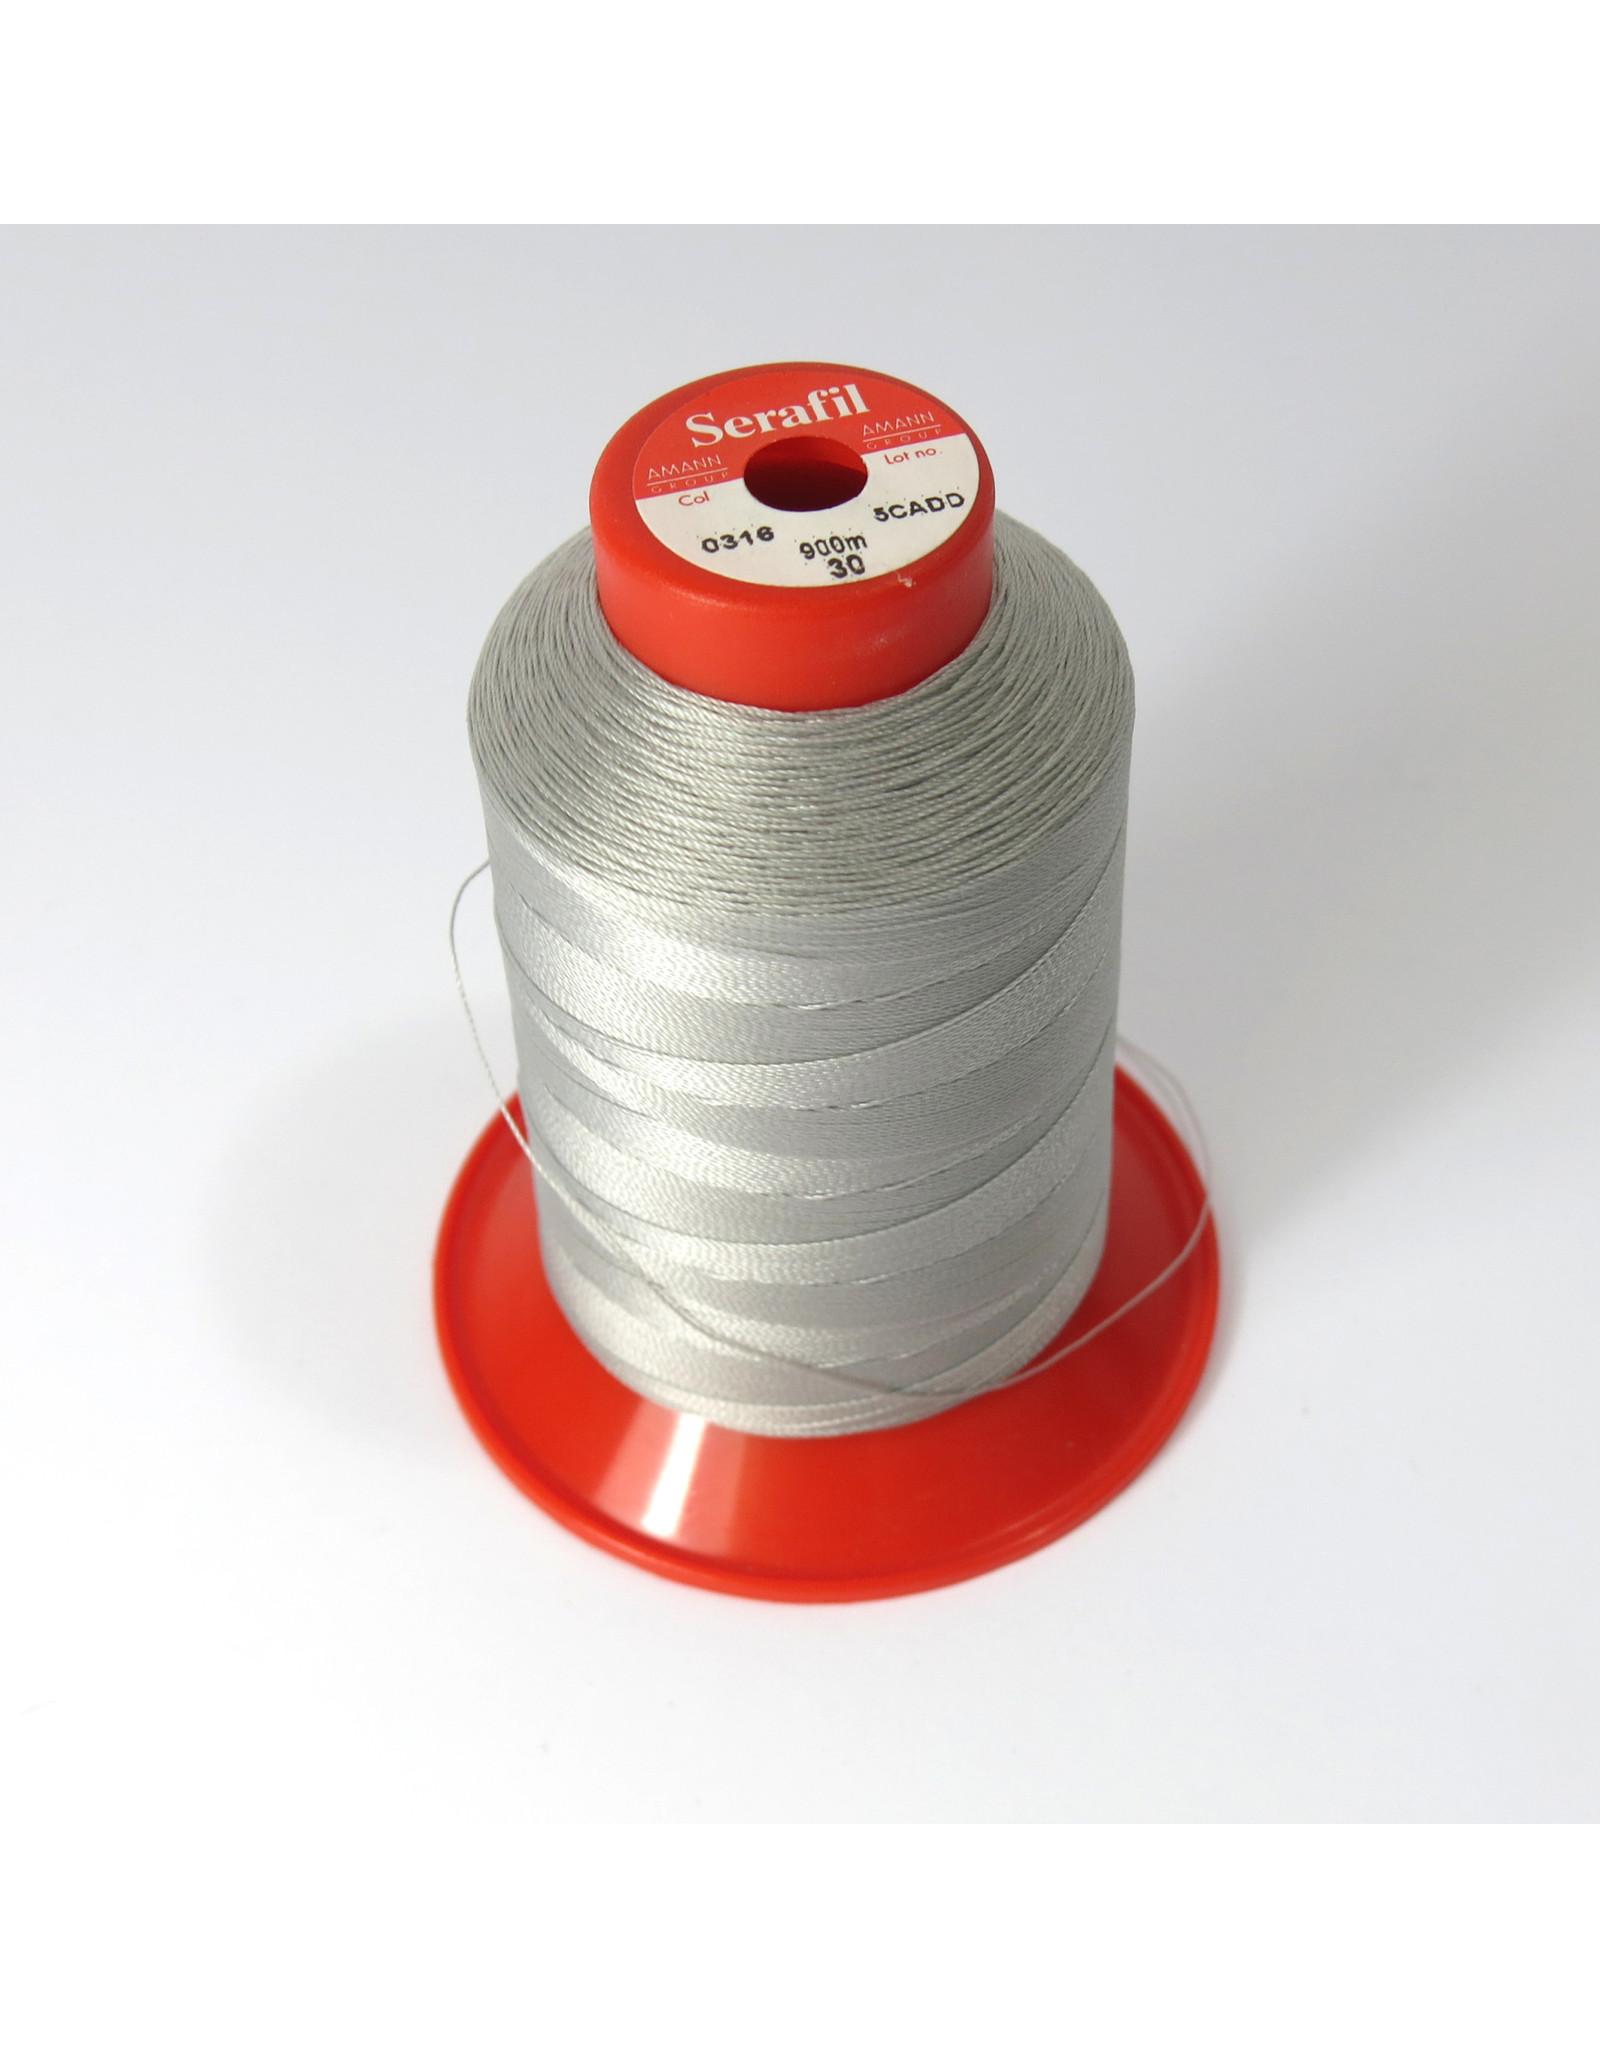 Serafil machine sewing threads 0316